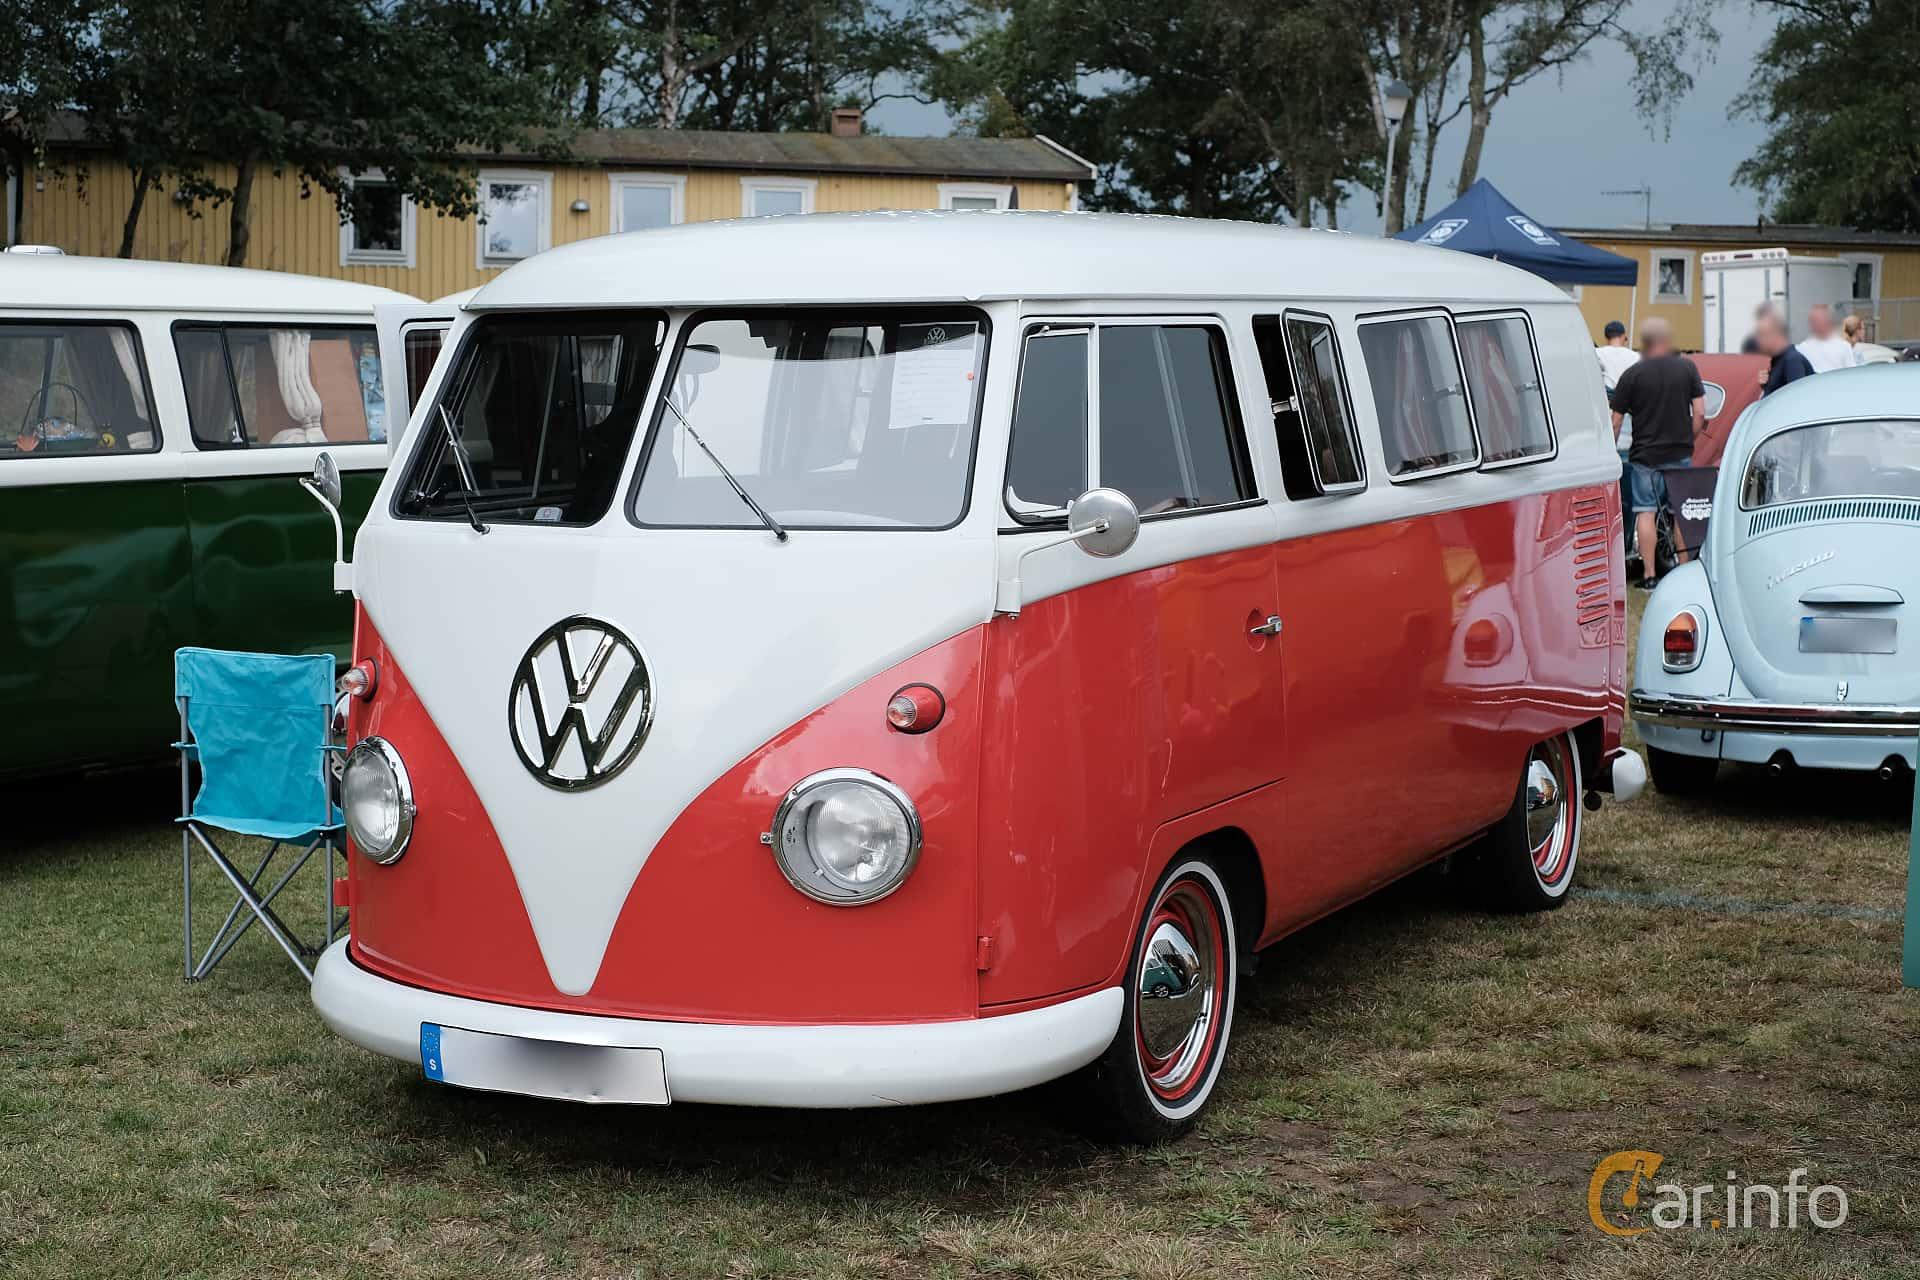 Volkswagen Transporter 1200 Minibus 1.2 Manuell, 34hk, 1960 at West Coast Bug Meet 2019